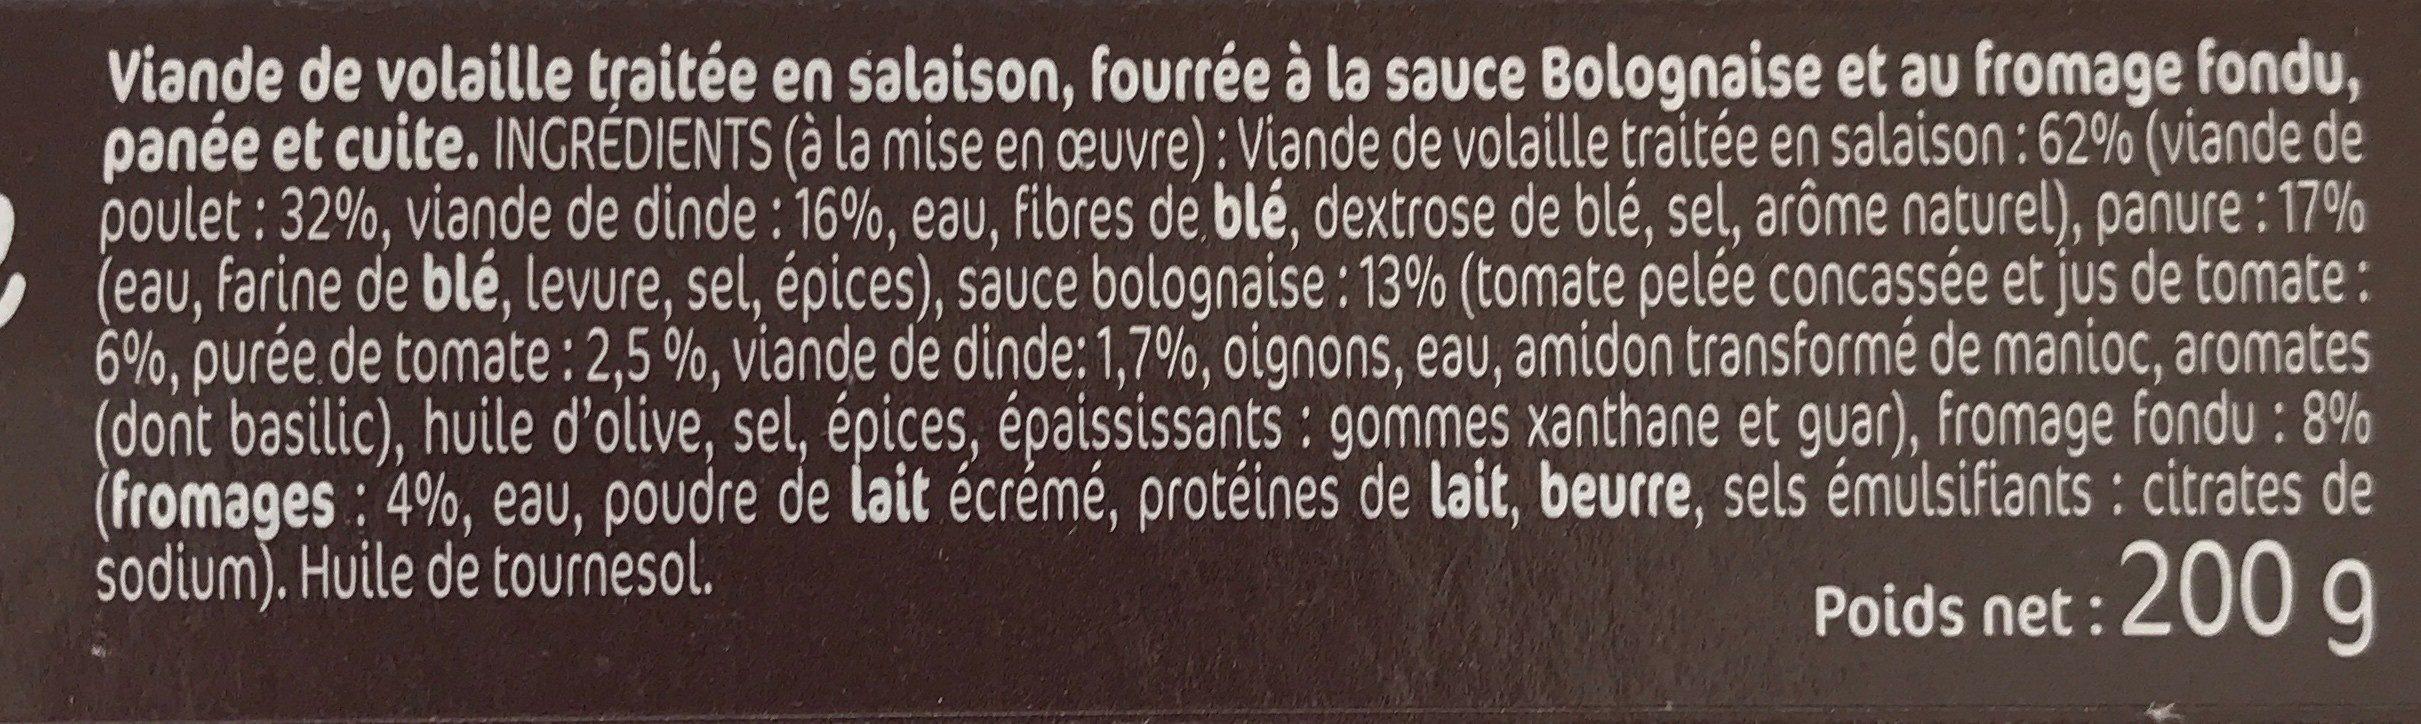 Croq' Façon Bolognaise Tomate Oignons - Ingrediënten